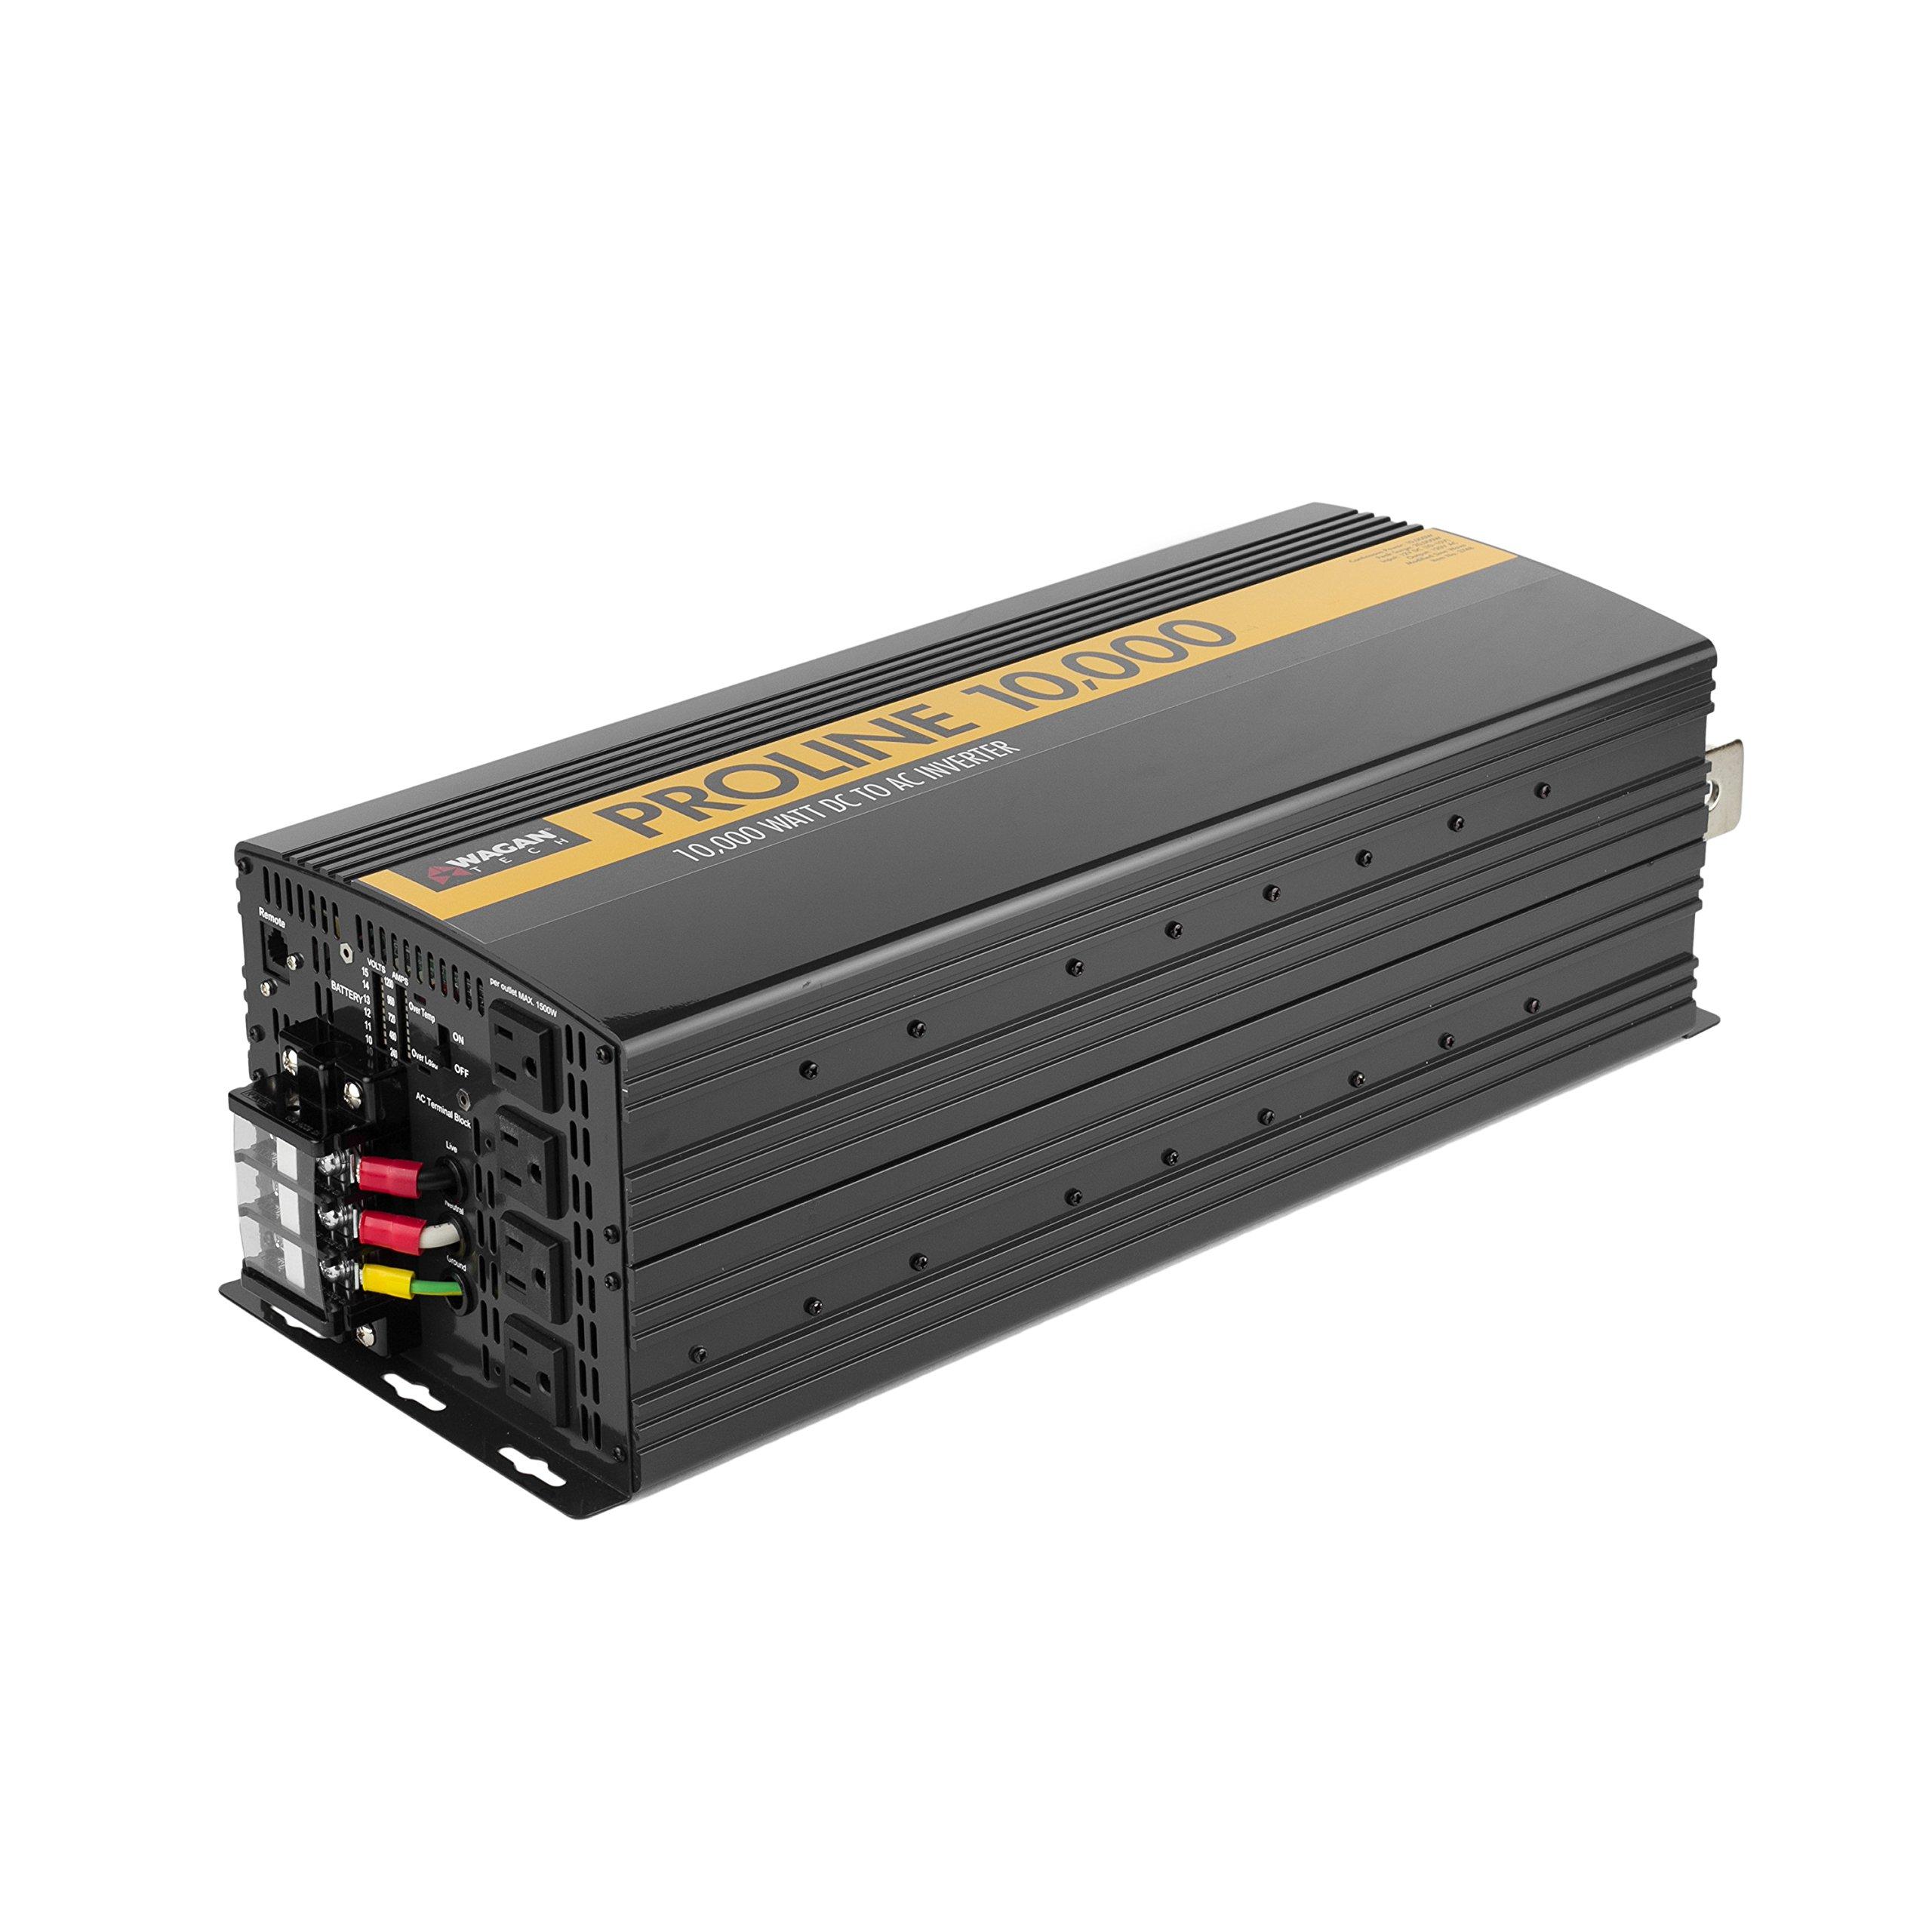 Wagan Black EL3748 12V 10000 Inverter with Remote